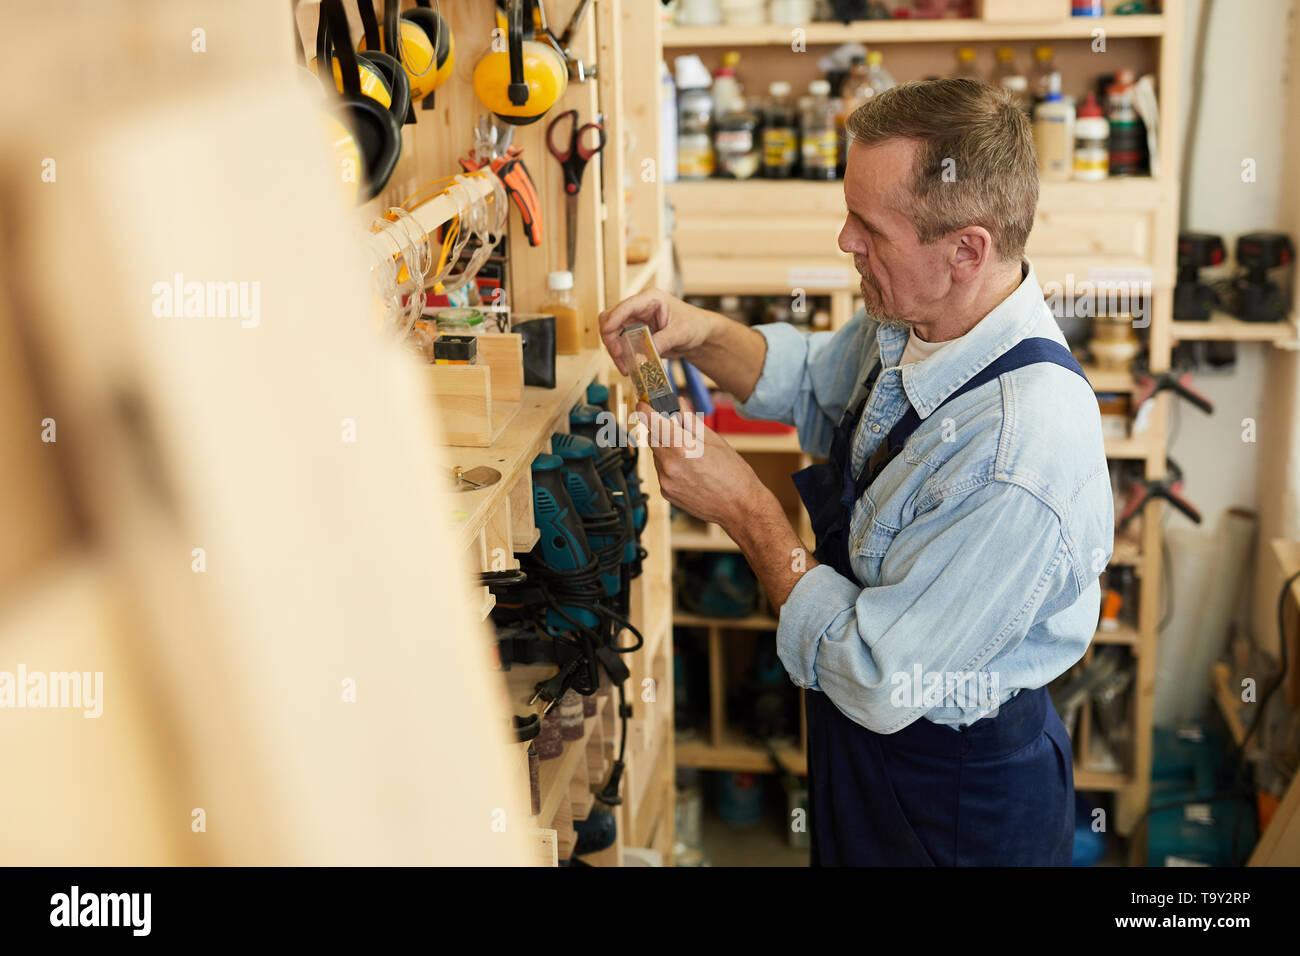 Side view portrait of senior carpenter choosing screws in workshop, copy space - Stock Image